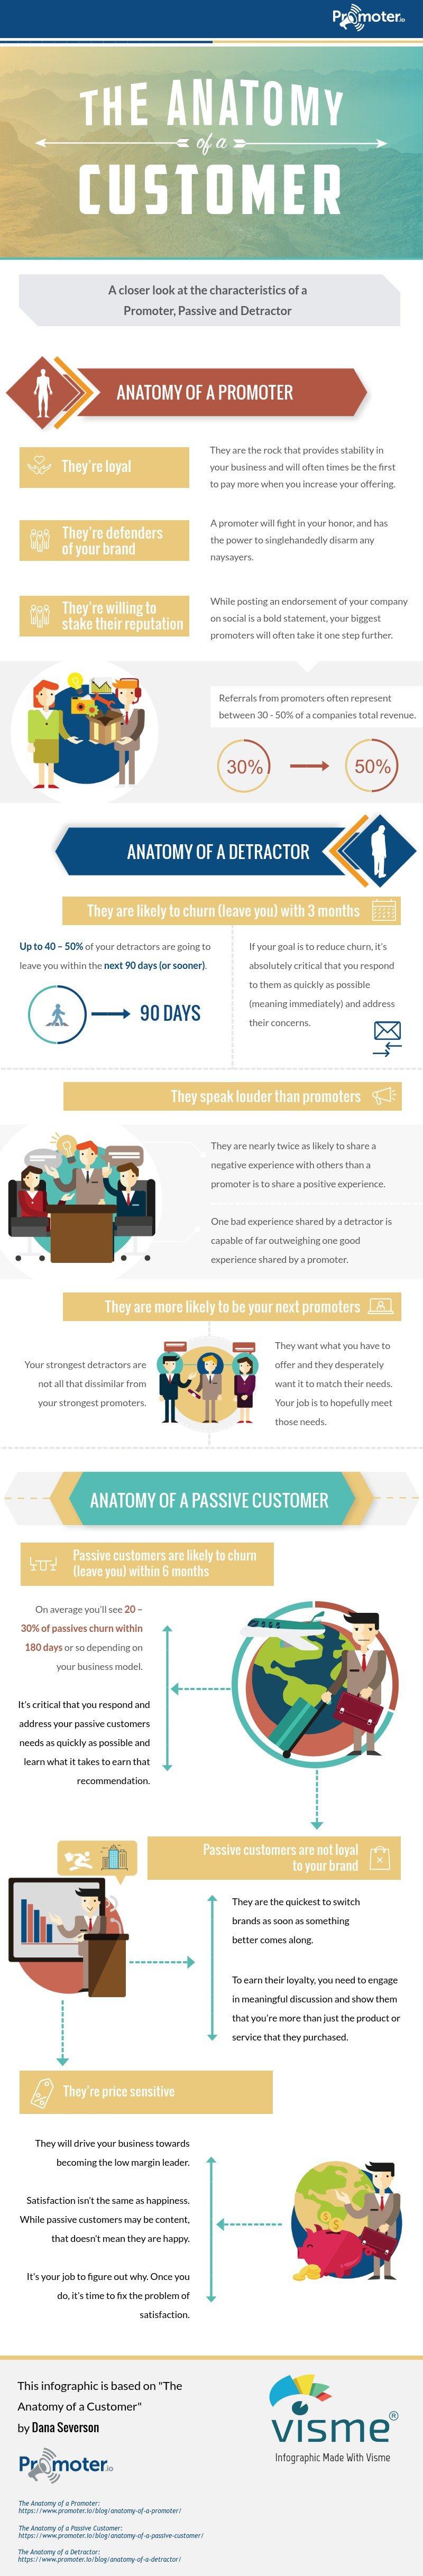 The Anatomy of a Customer.jpg